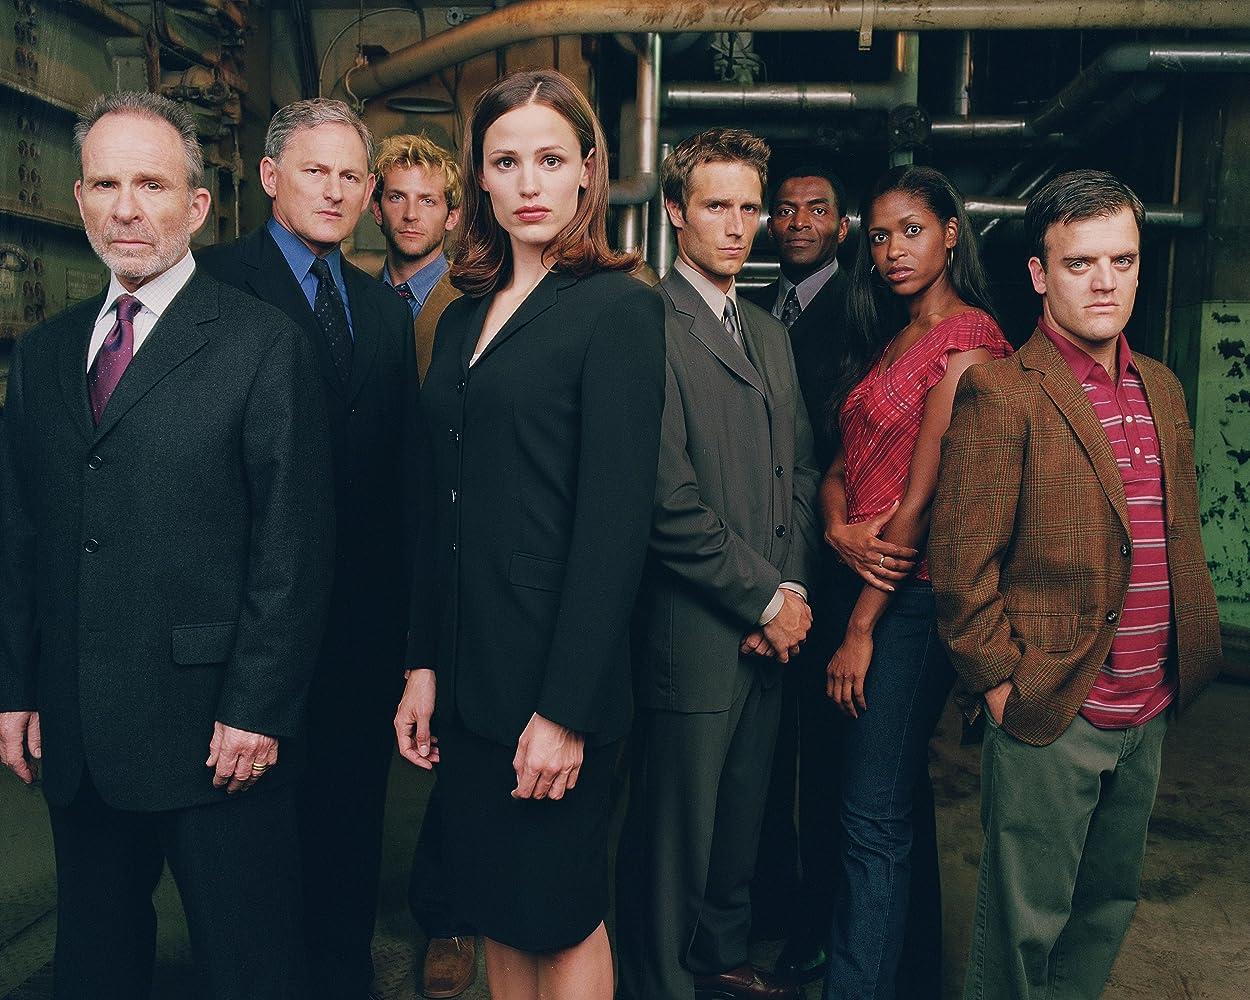 Victor Garber, Jennifer Garner, Bradley Cooper, Merrin Dungey, Carl Lumbly, Ron Rifkin, Michael Vartan, and Kevin Weisman in Alias (2001)